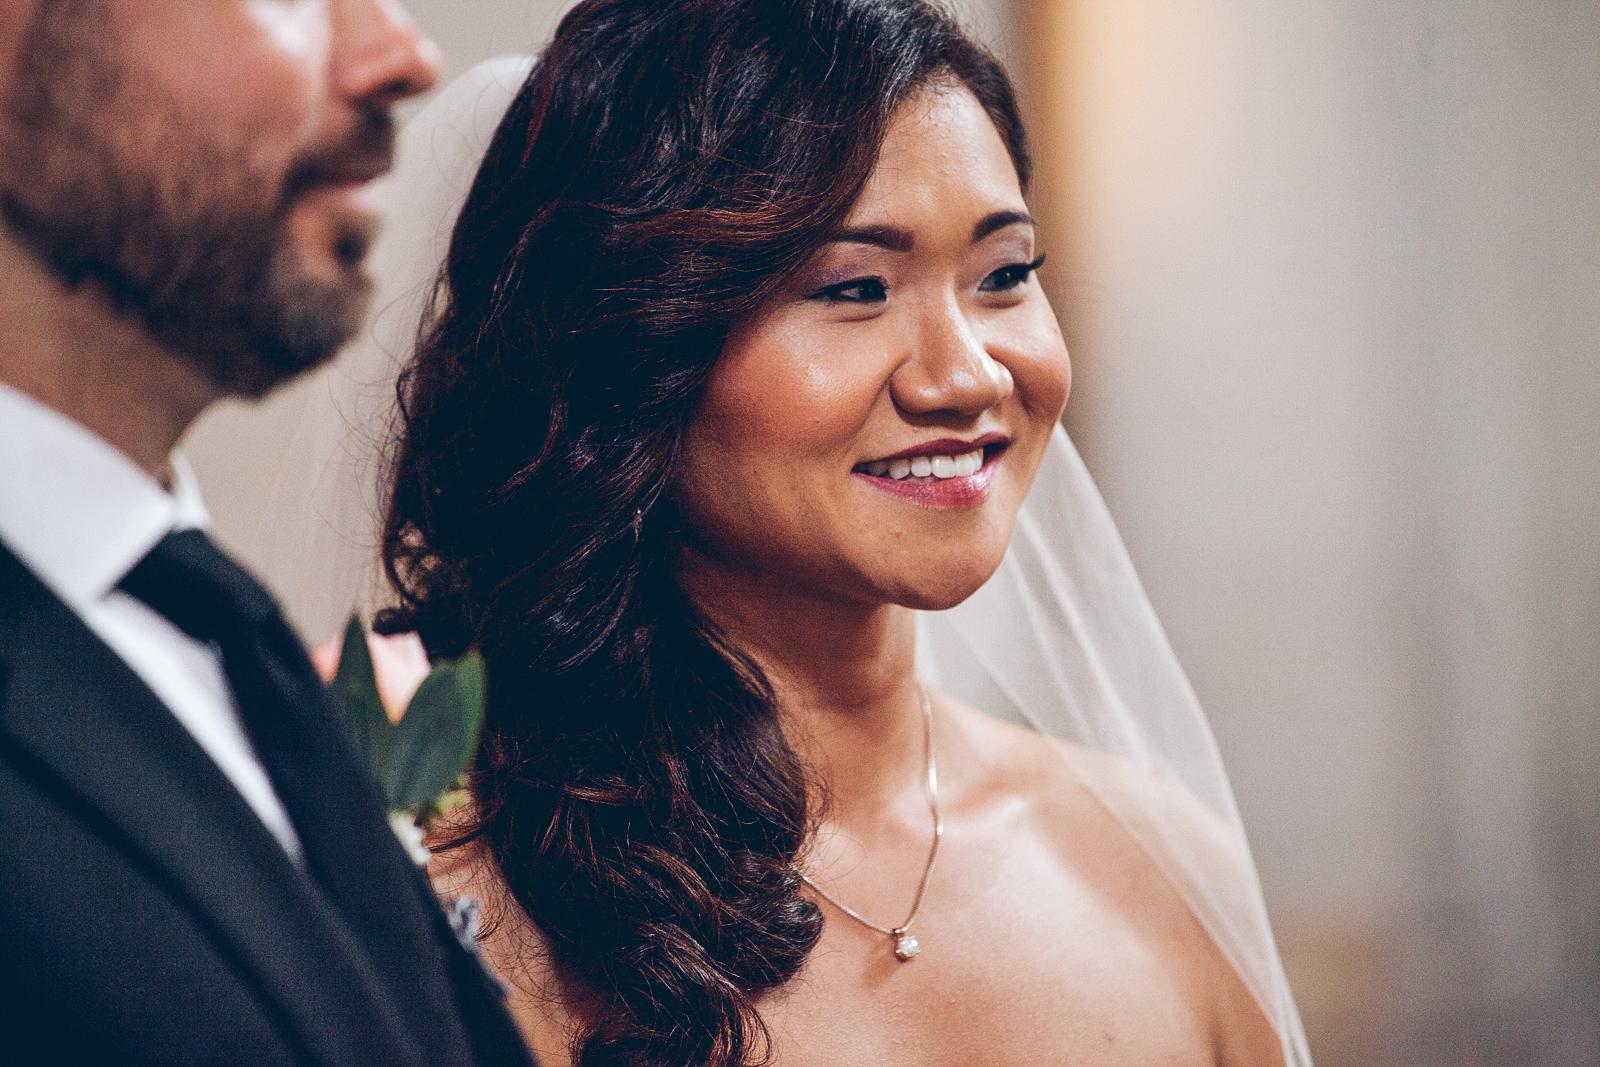 San_francisco_city_hall_wedding_photography_meegan_travis_ebony_siovhan_bokeh_photography_15.jpg